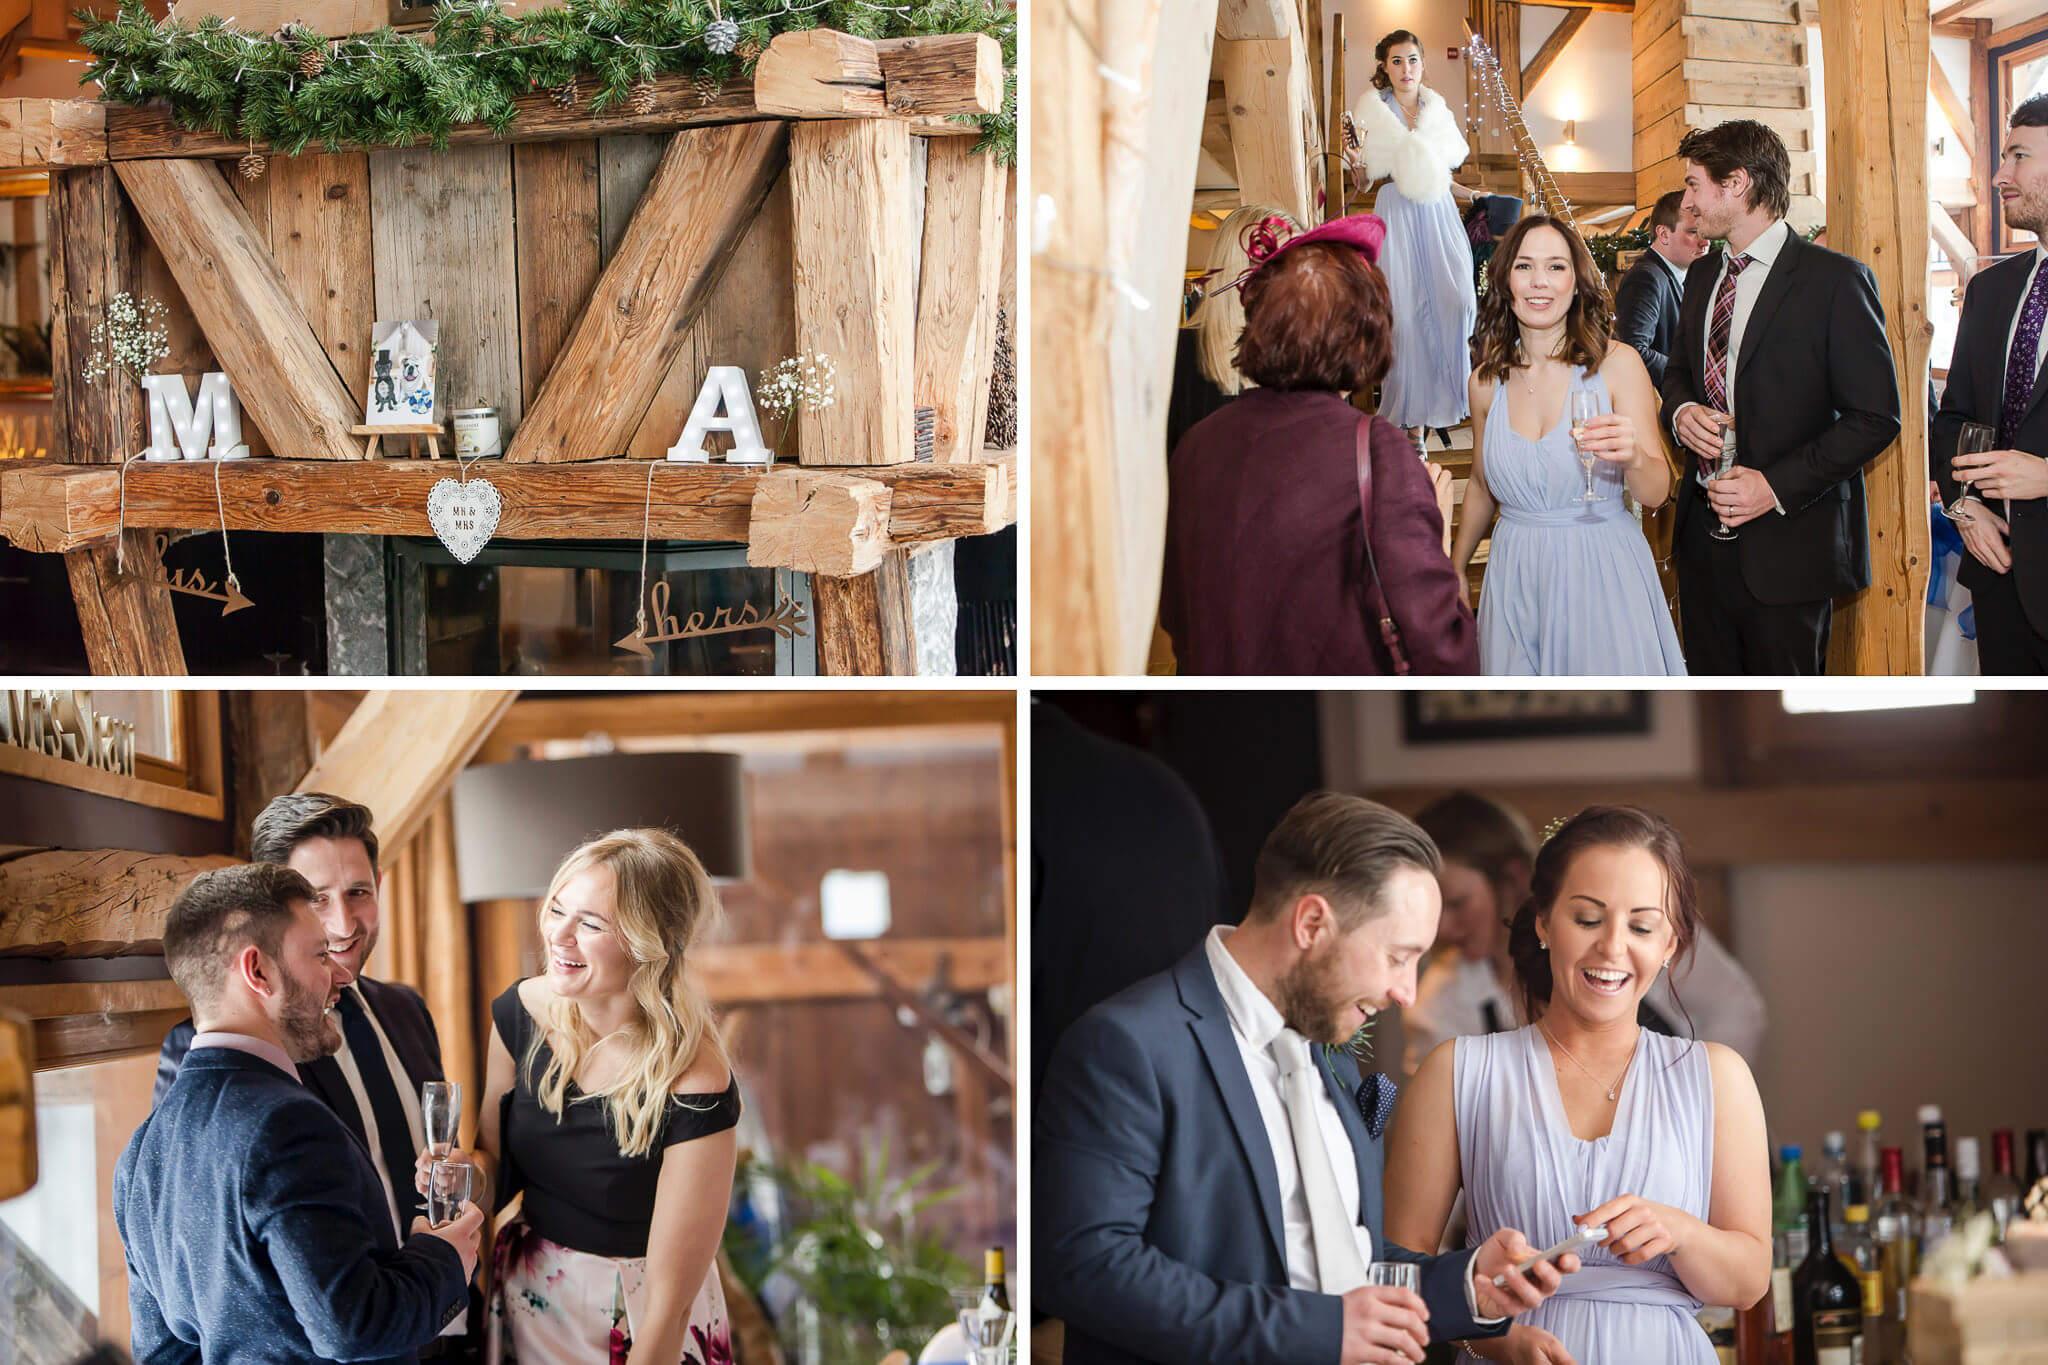 best-france-sameons-destination-wedding-photographer-stanbury-photography-001